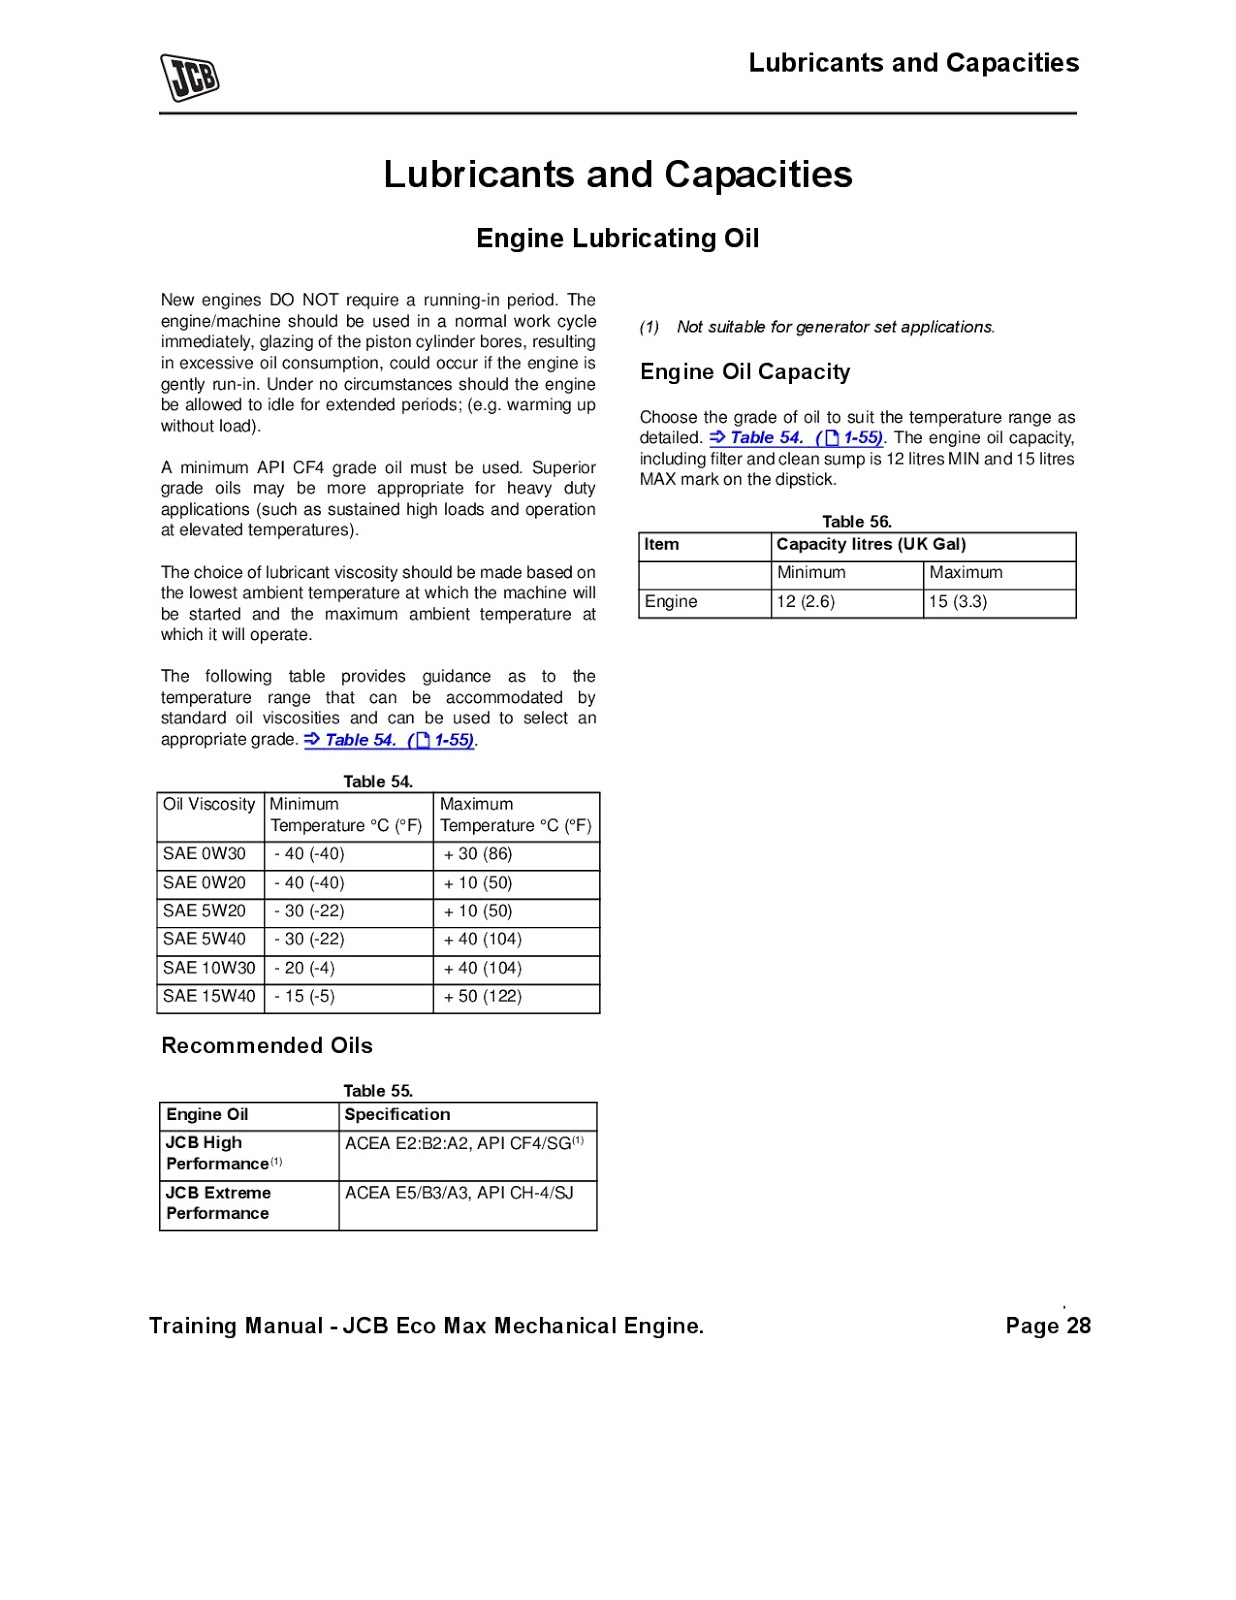 ALLKnowledgeFun: JCB BASIC ENGINE TRAINING MANUAL 1